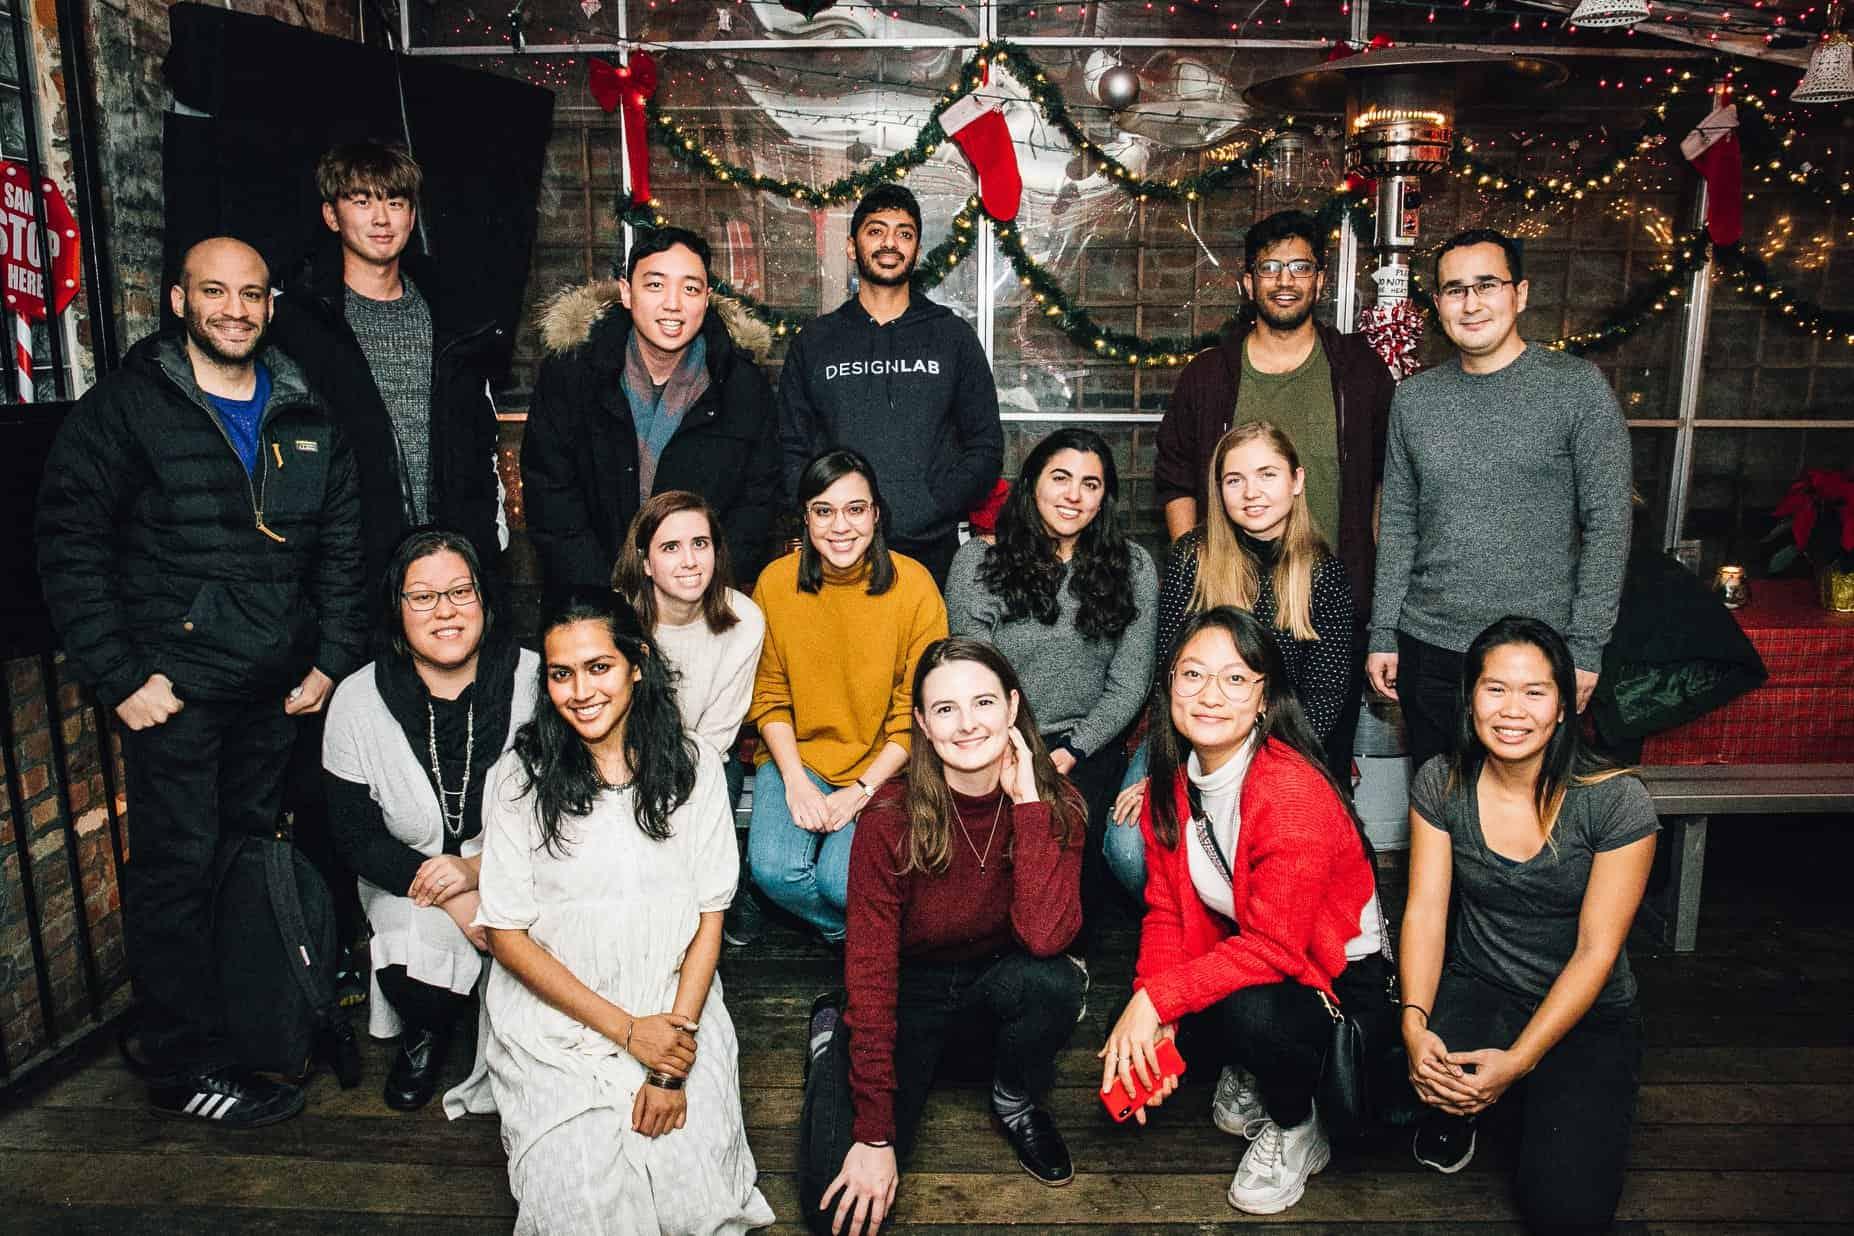 DesignLab students